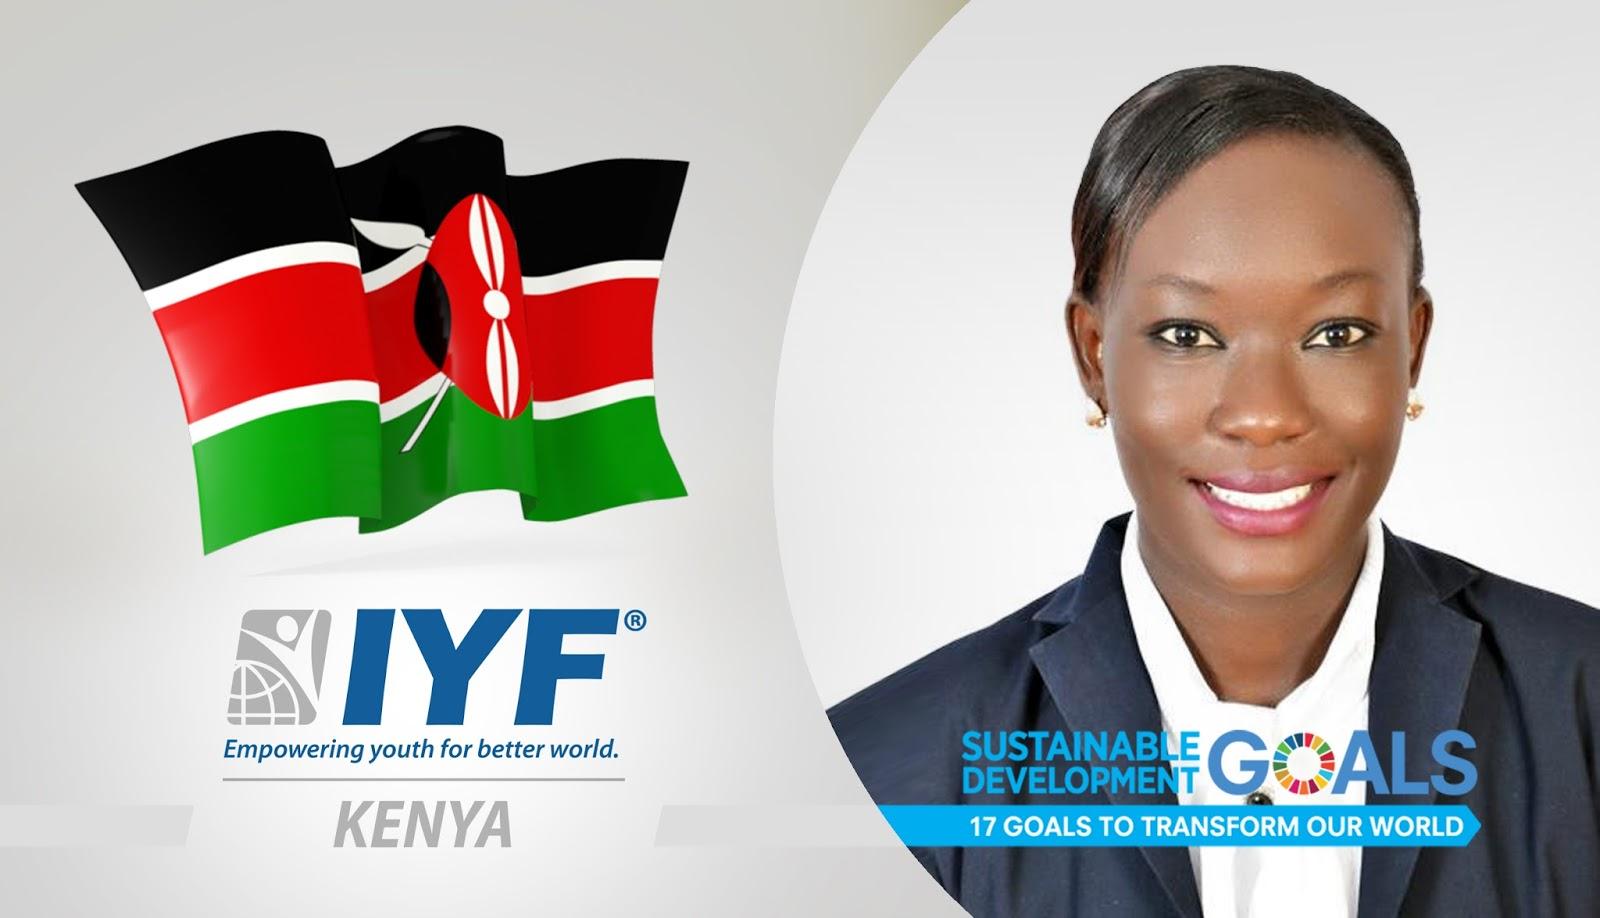 Valerie Opiyo, IYF Representative in Kenya